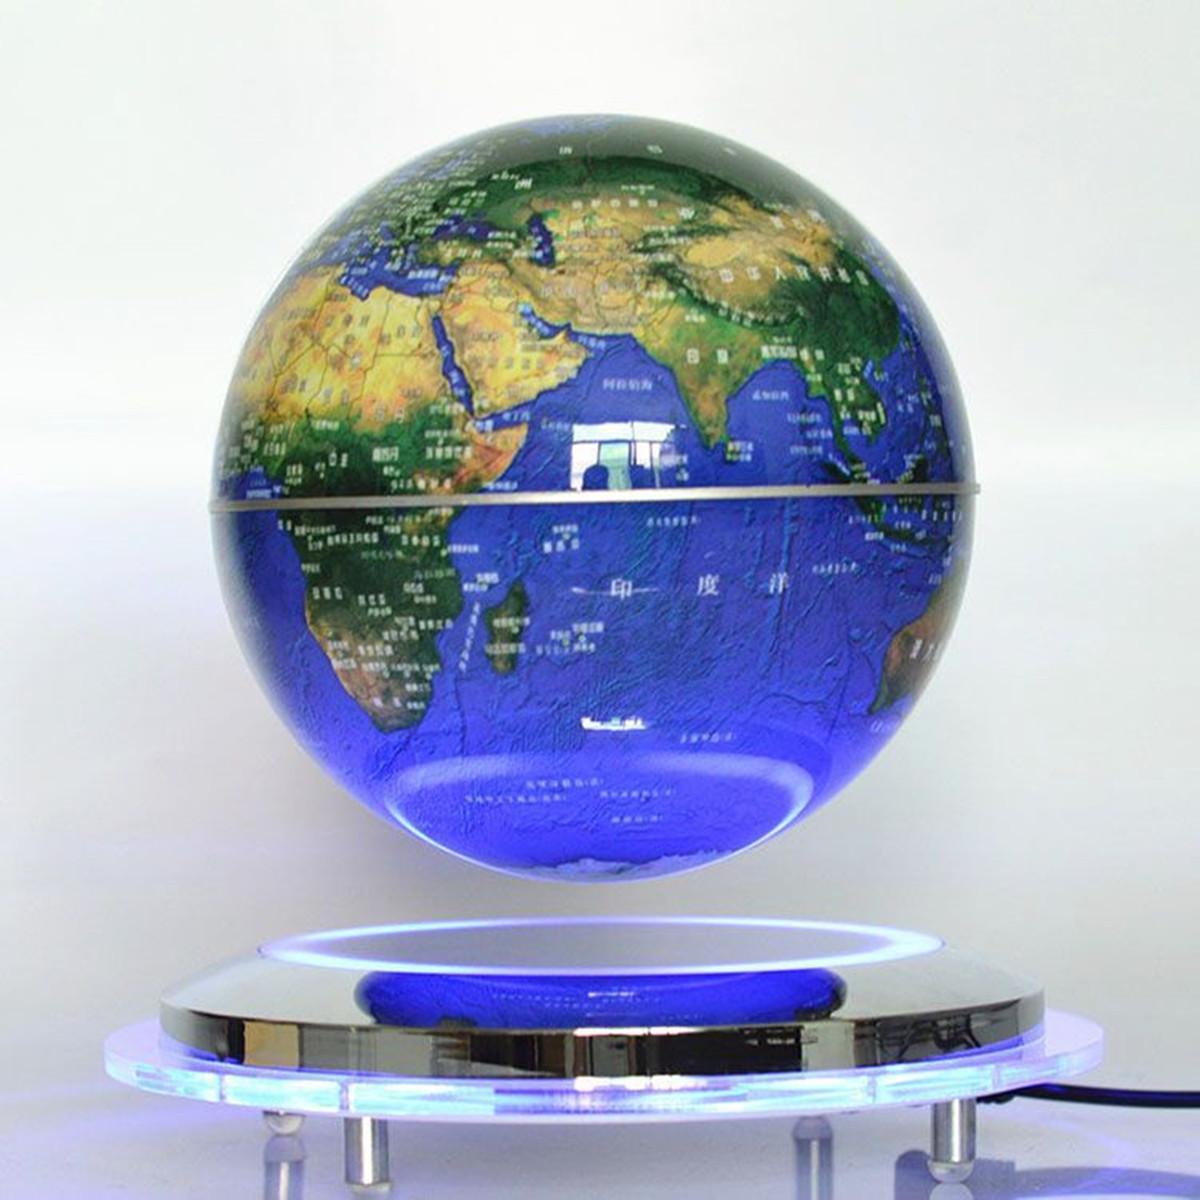 8 led magnetic levitation world map light decor floating globe 8 led magnetic levitation world map light decor gumiabroncs Image collections